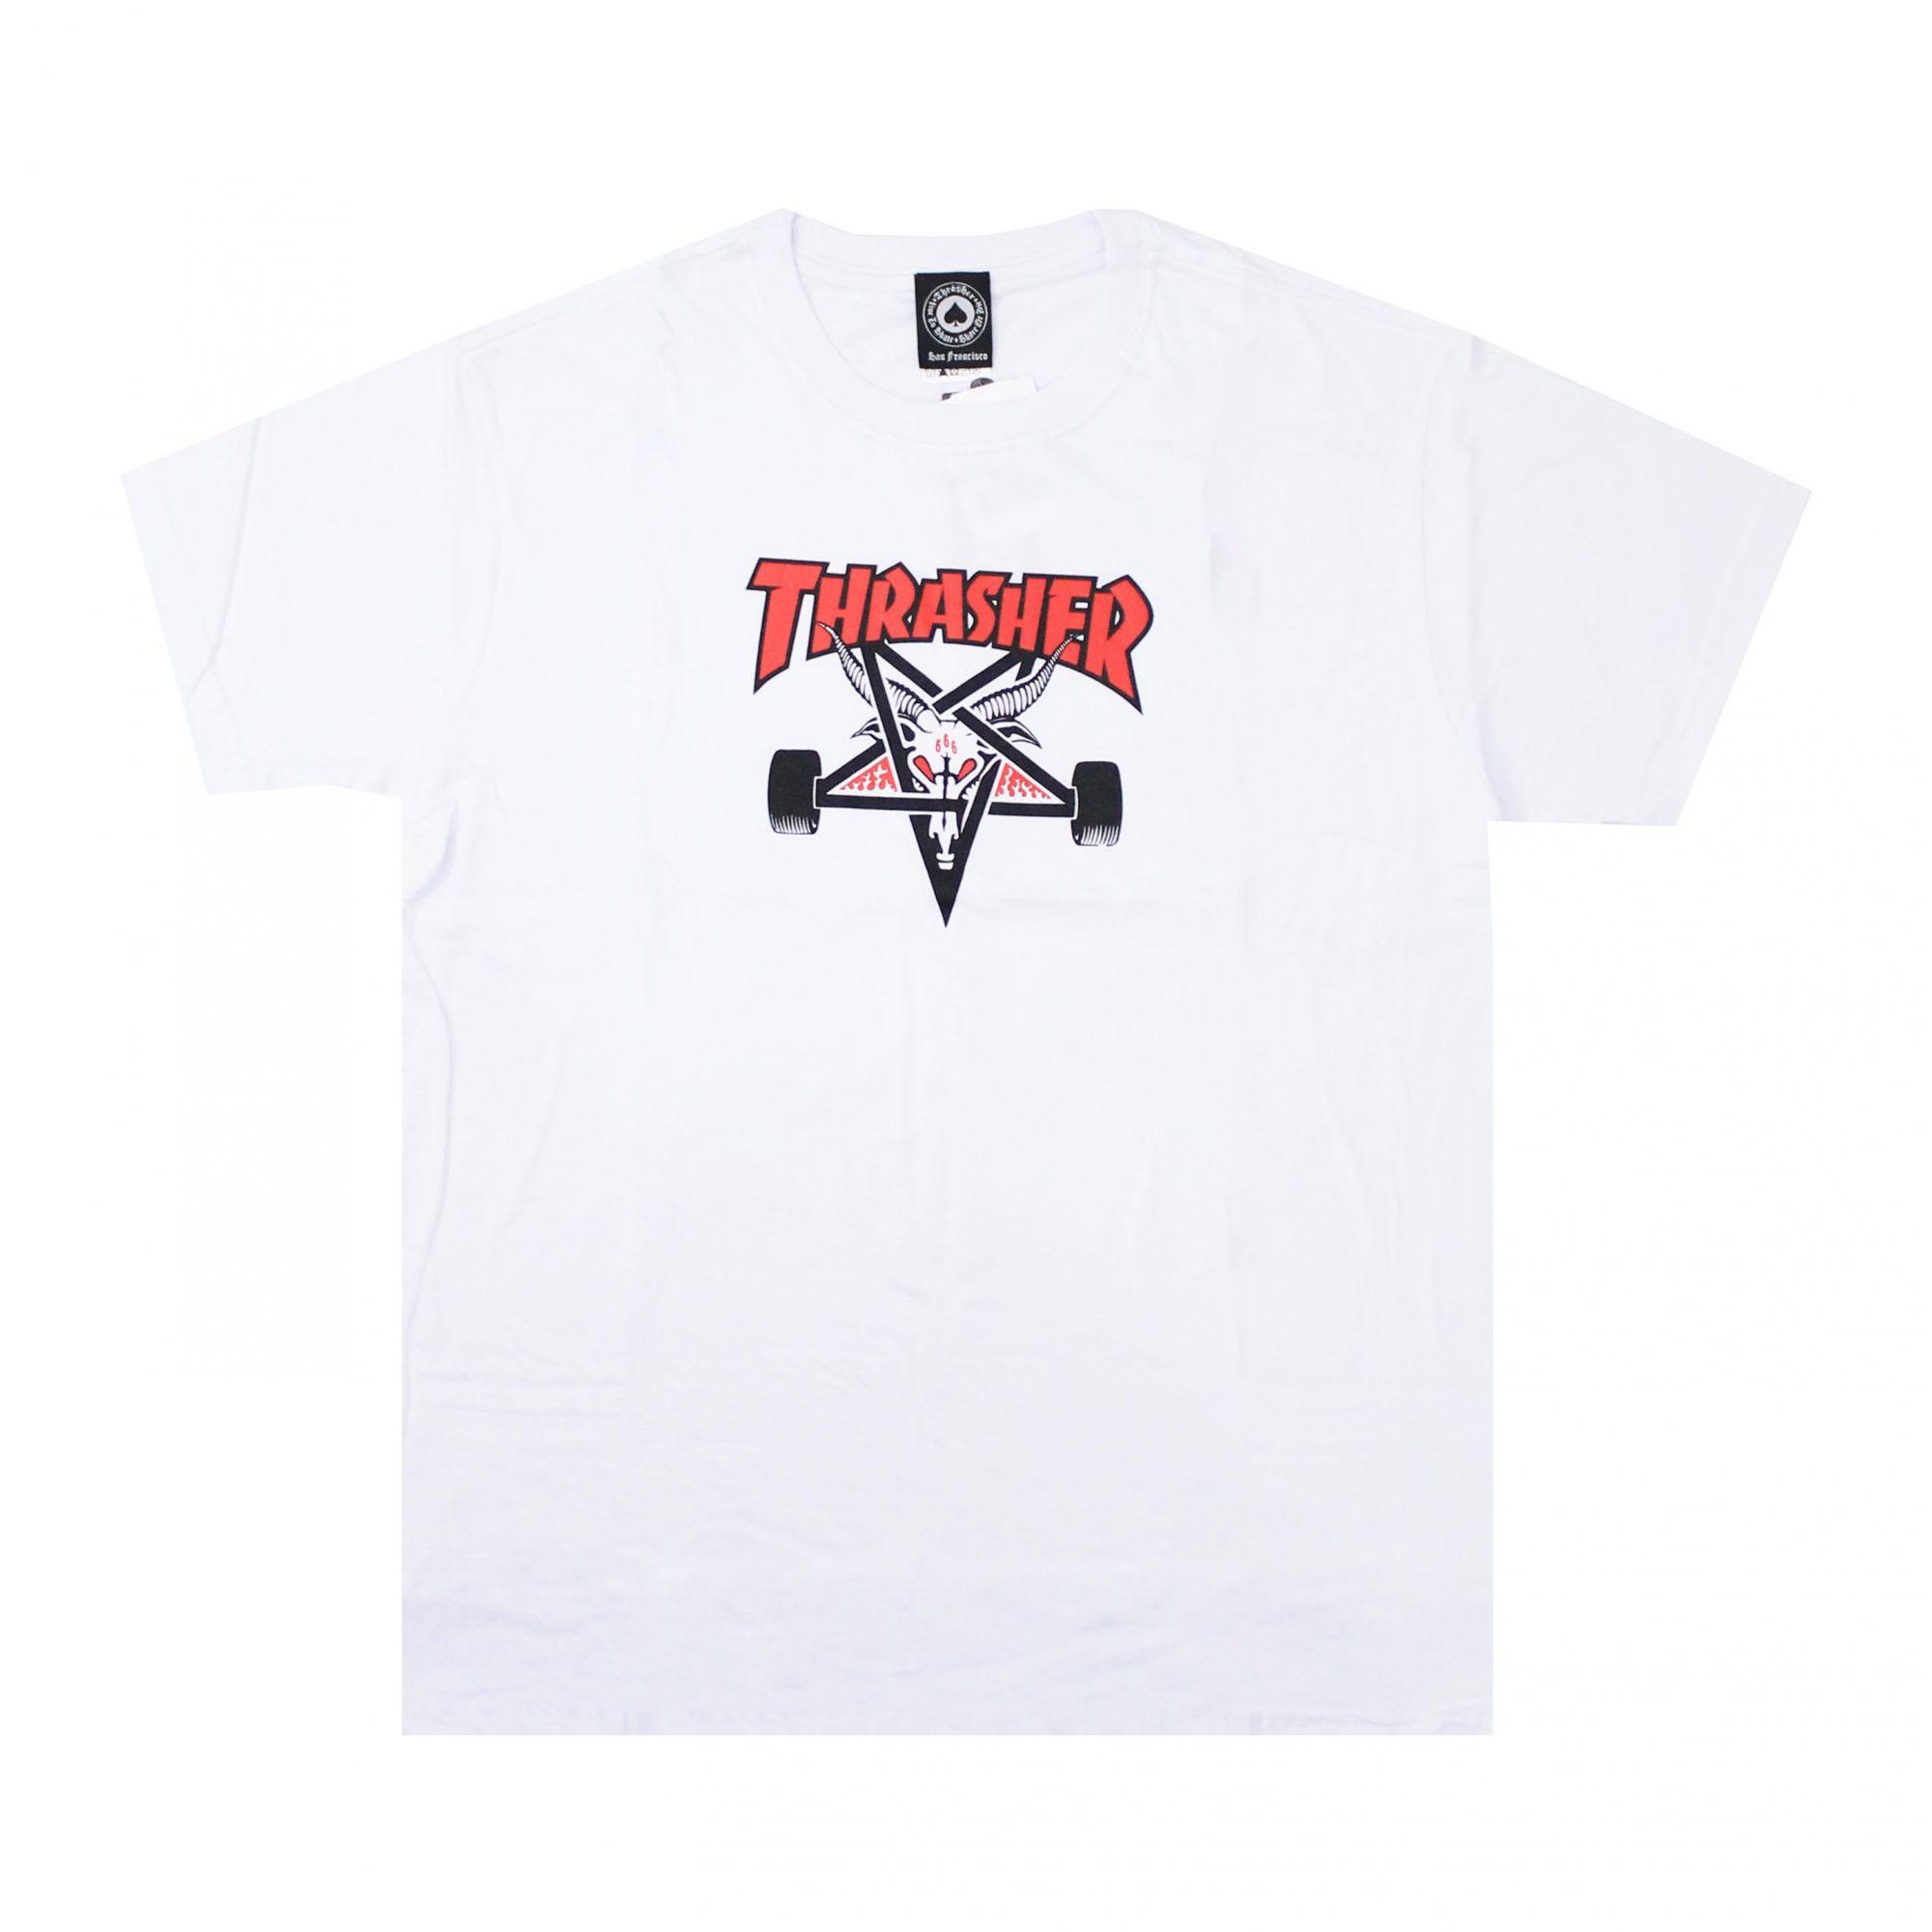 Camiseta Thrasher Magazine Two Tone Skate Goat Branco